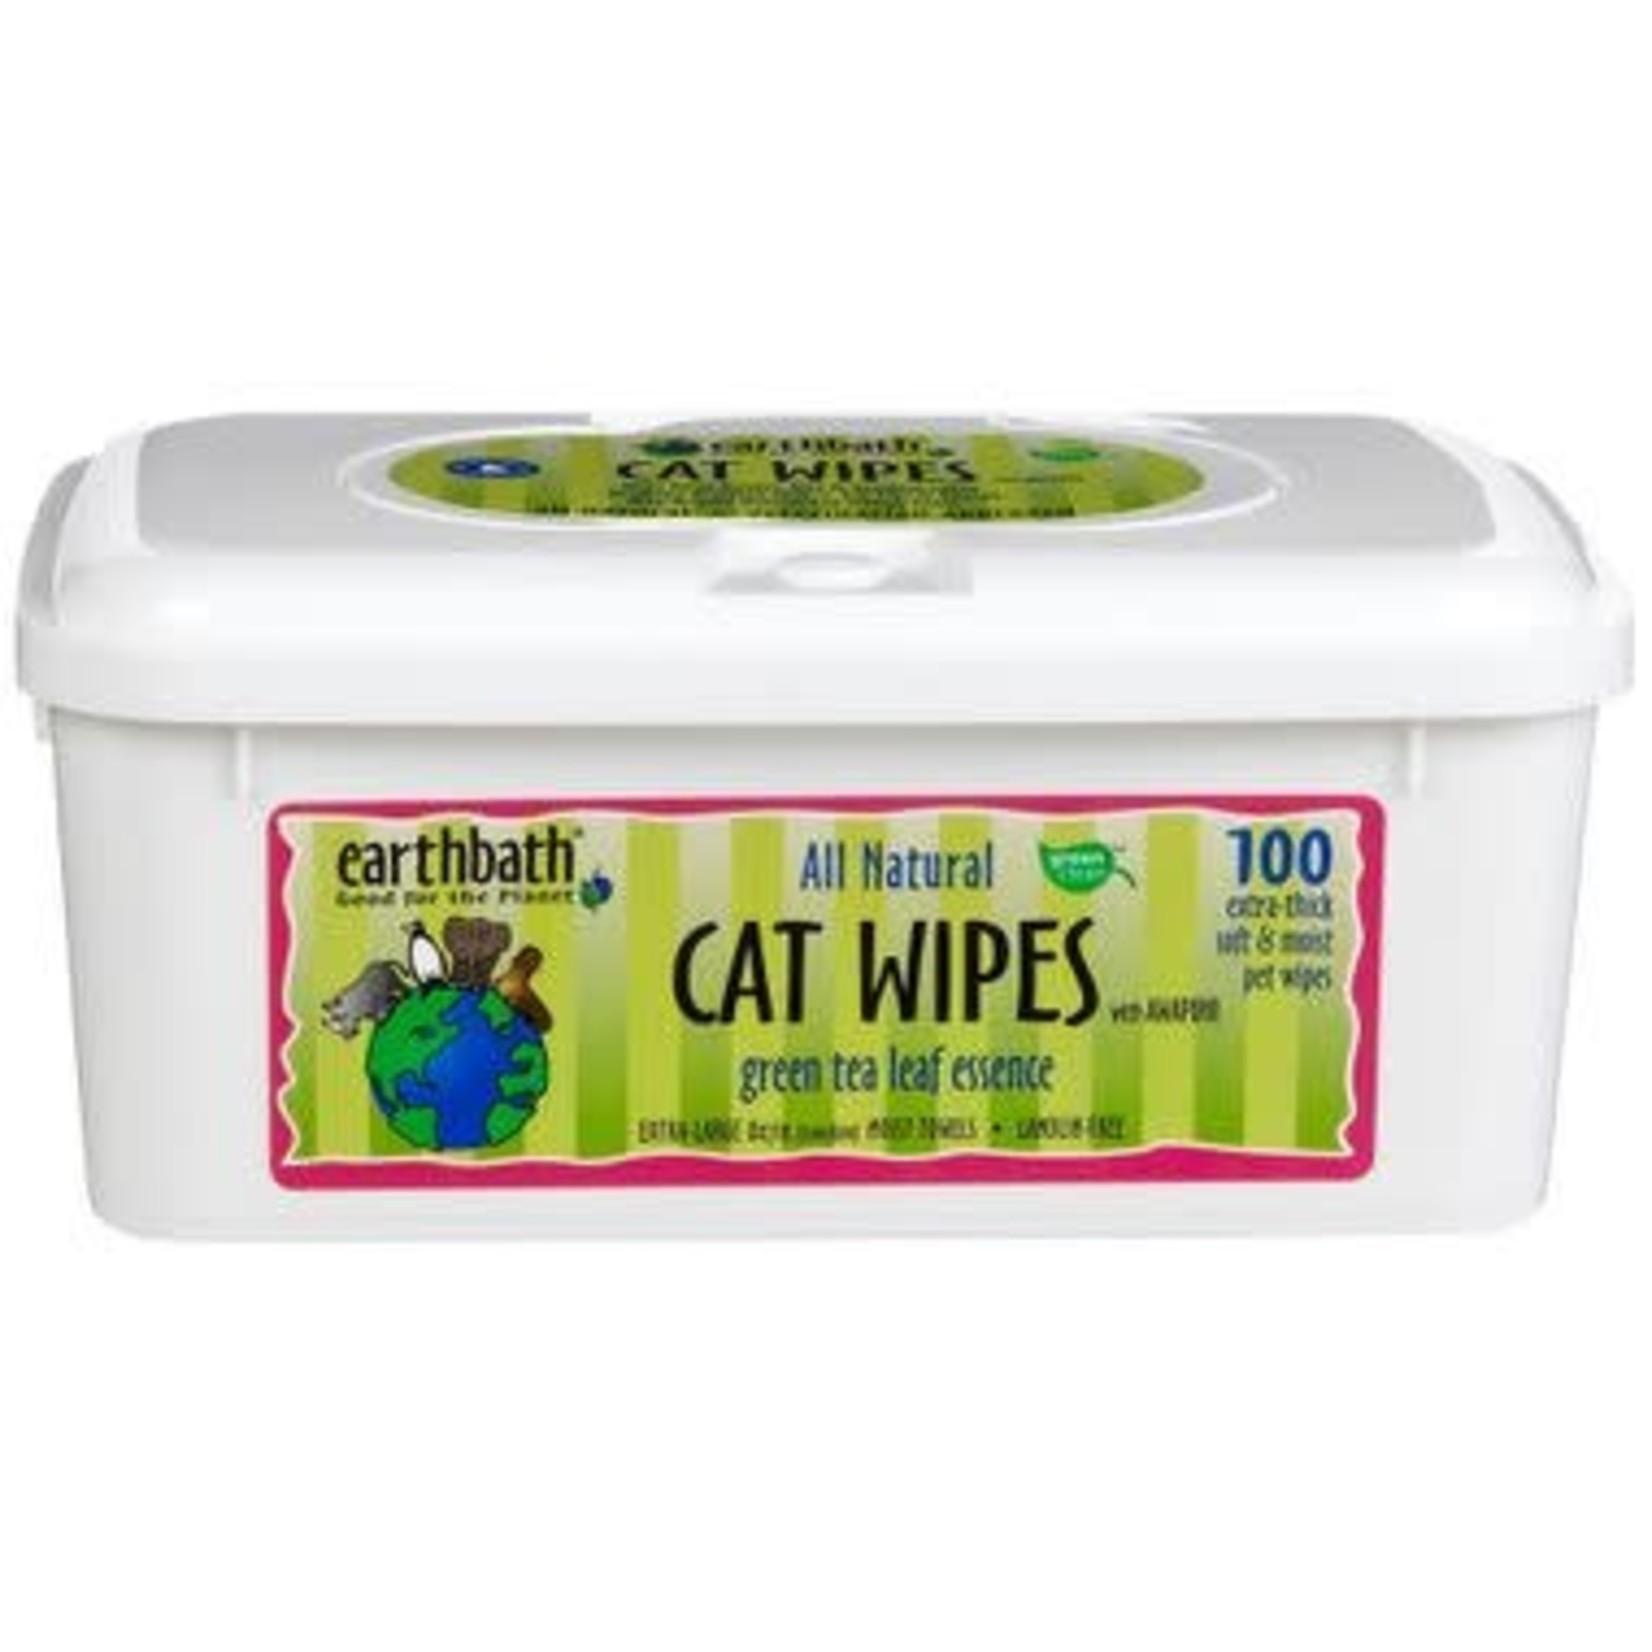 Earth Bath / Shea Pet Earth Bath Cat Wipes Green Tea 100 Count